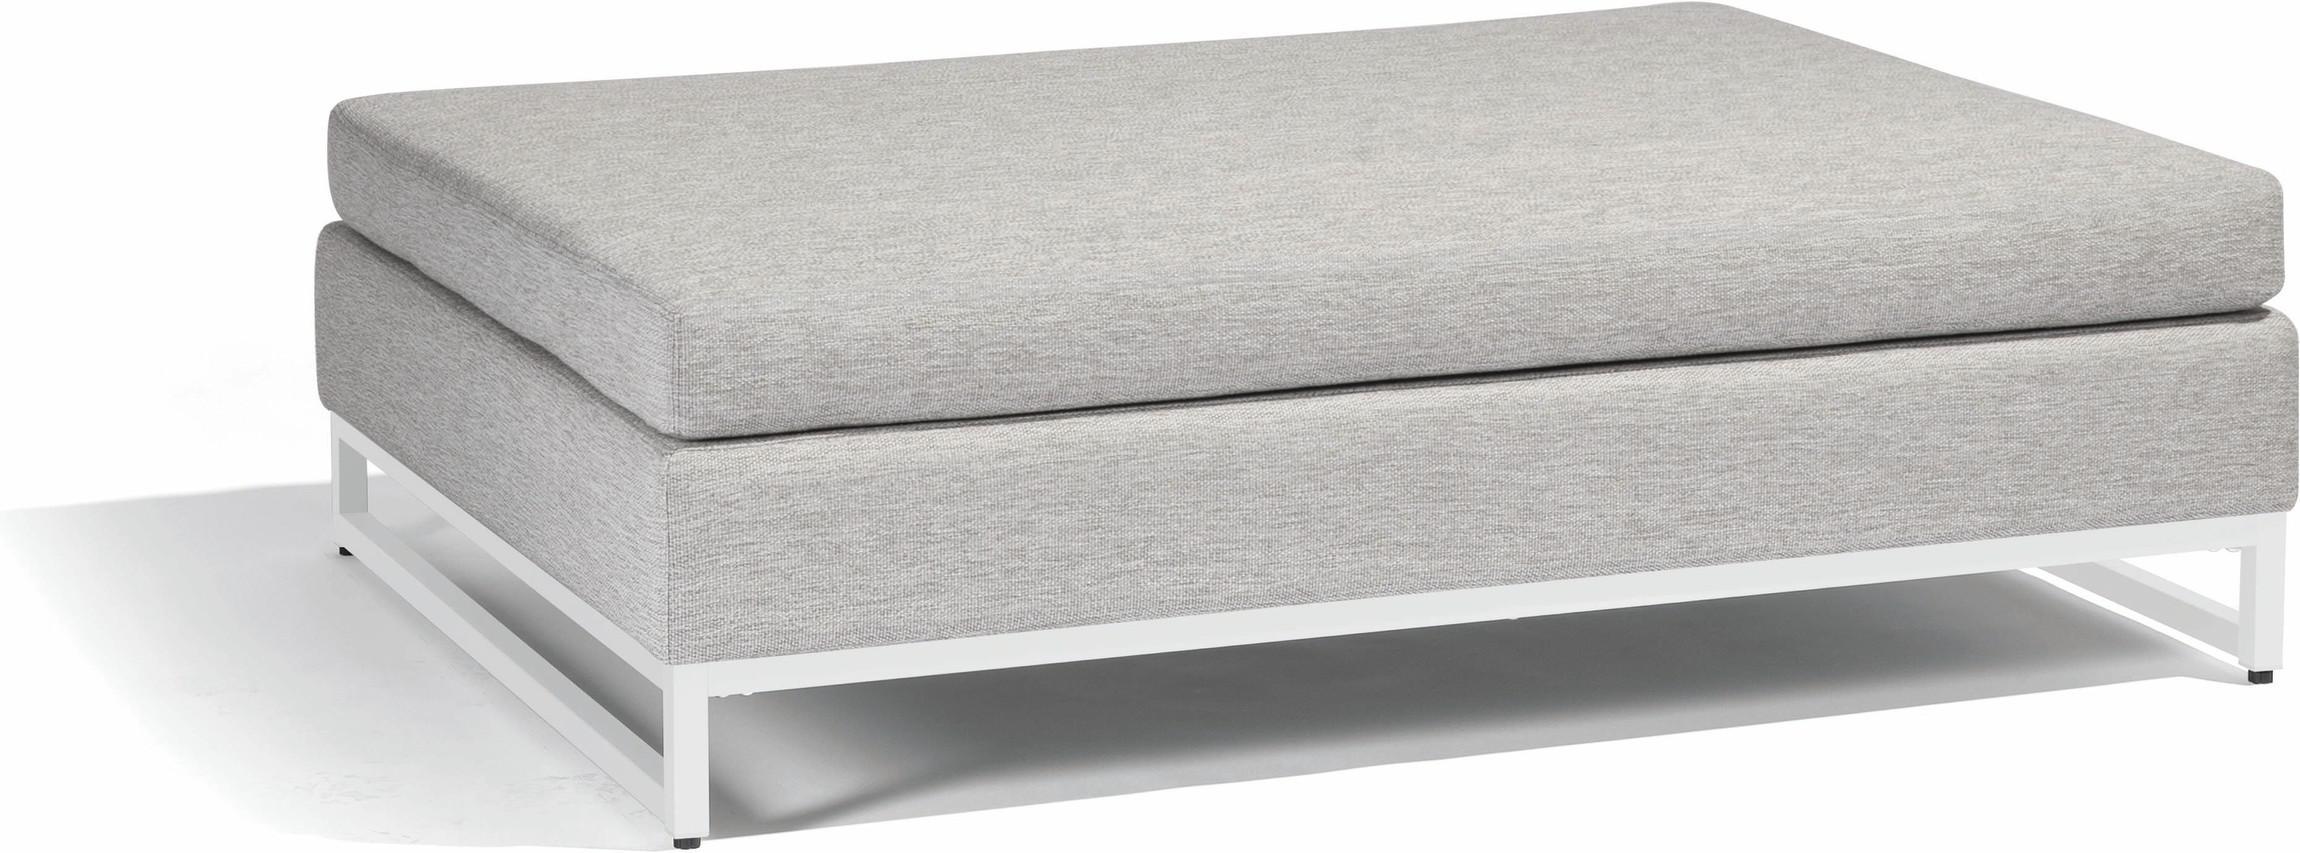 Zendo large footstool - white - lotus smokey